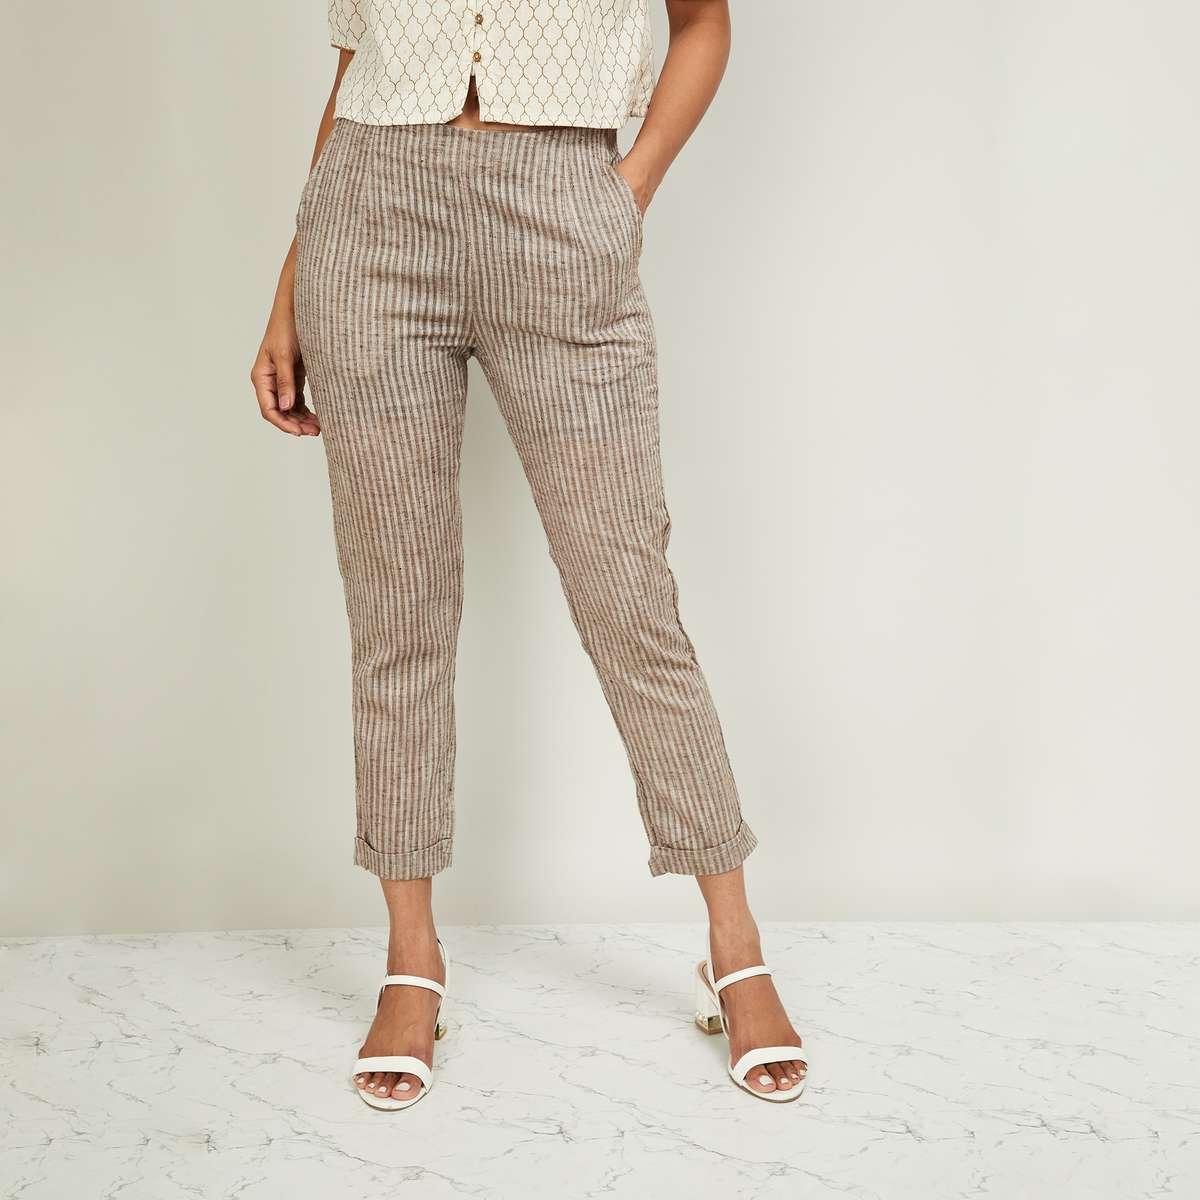 7.DE MOZA Women Striped Straight Pants